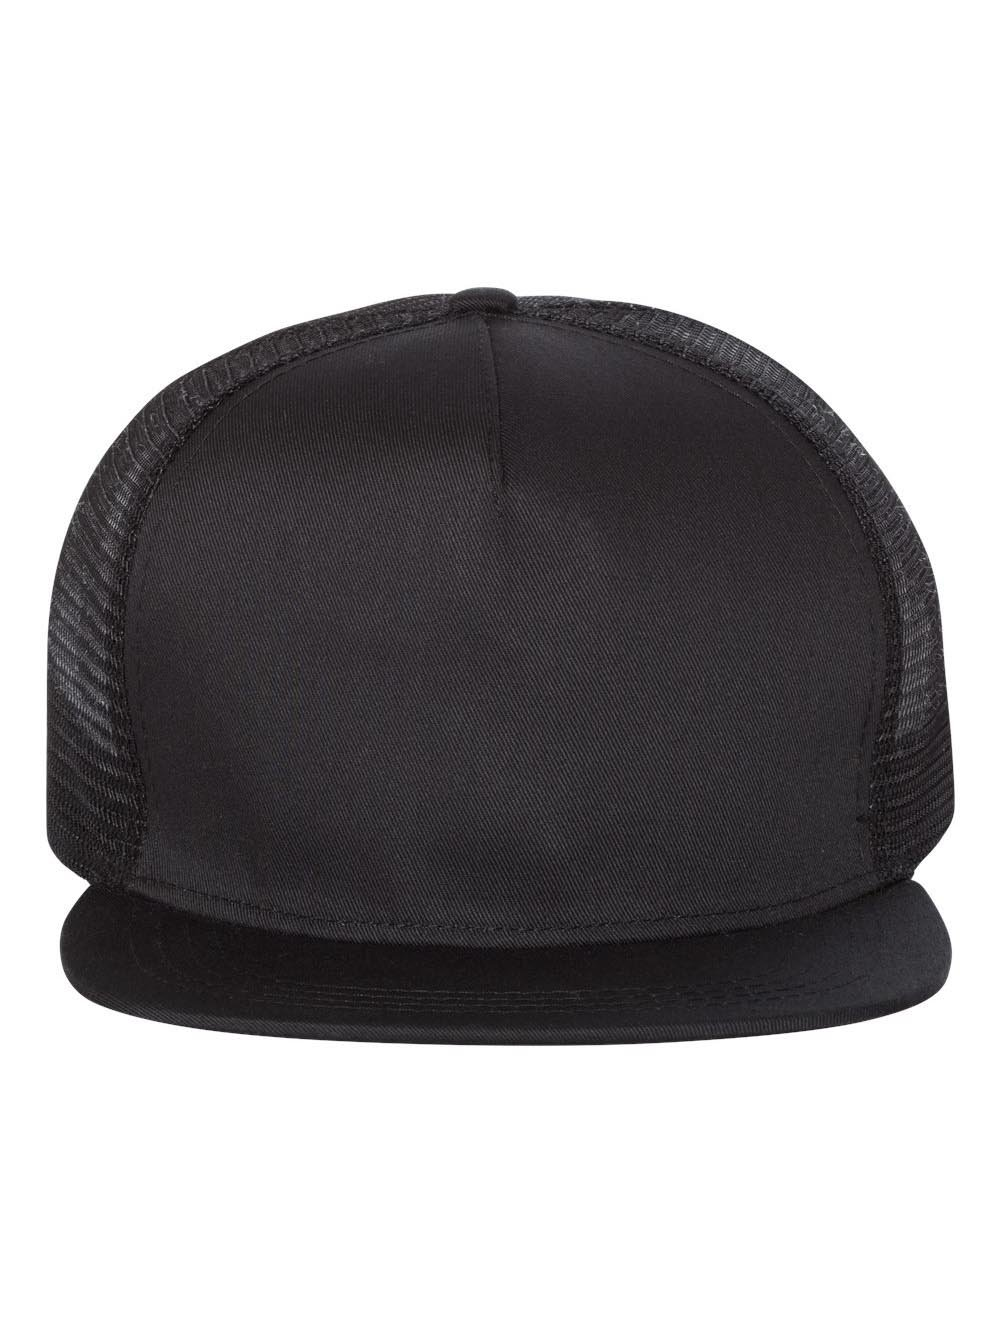 Mega Cap HAT メンズ B0727KNHR8 L|ブラック ブラック L